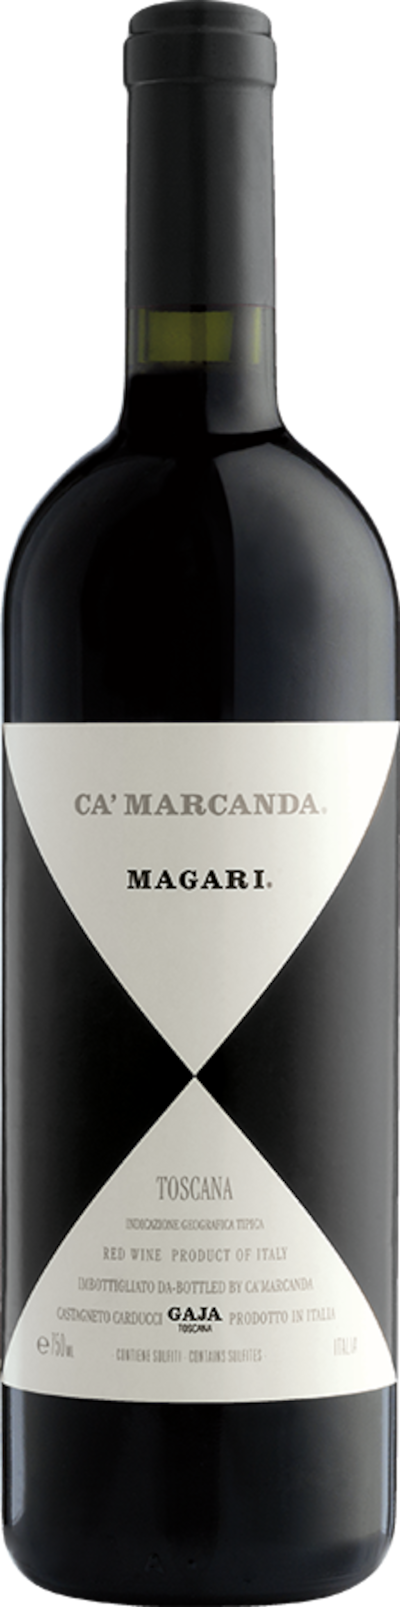 Ca' Marcanda - Magari Bolgheri DOP